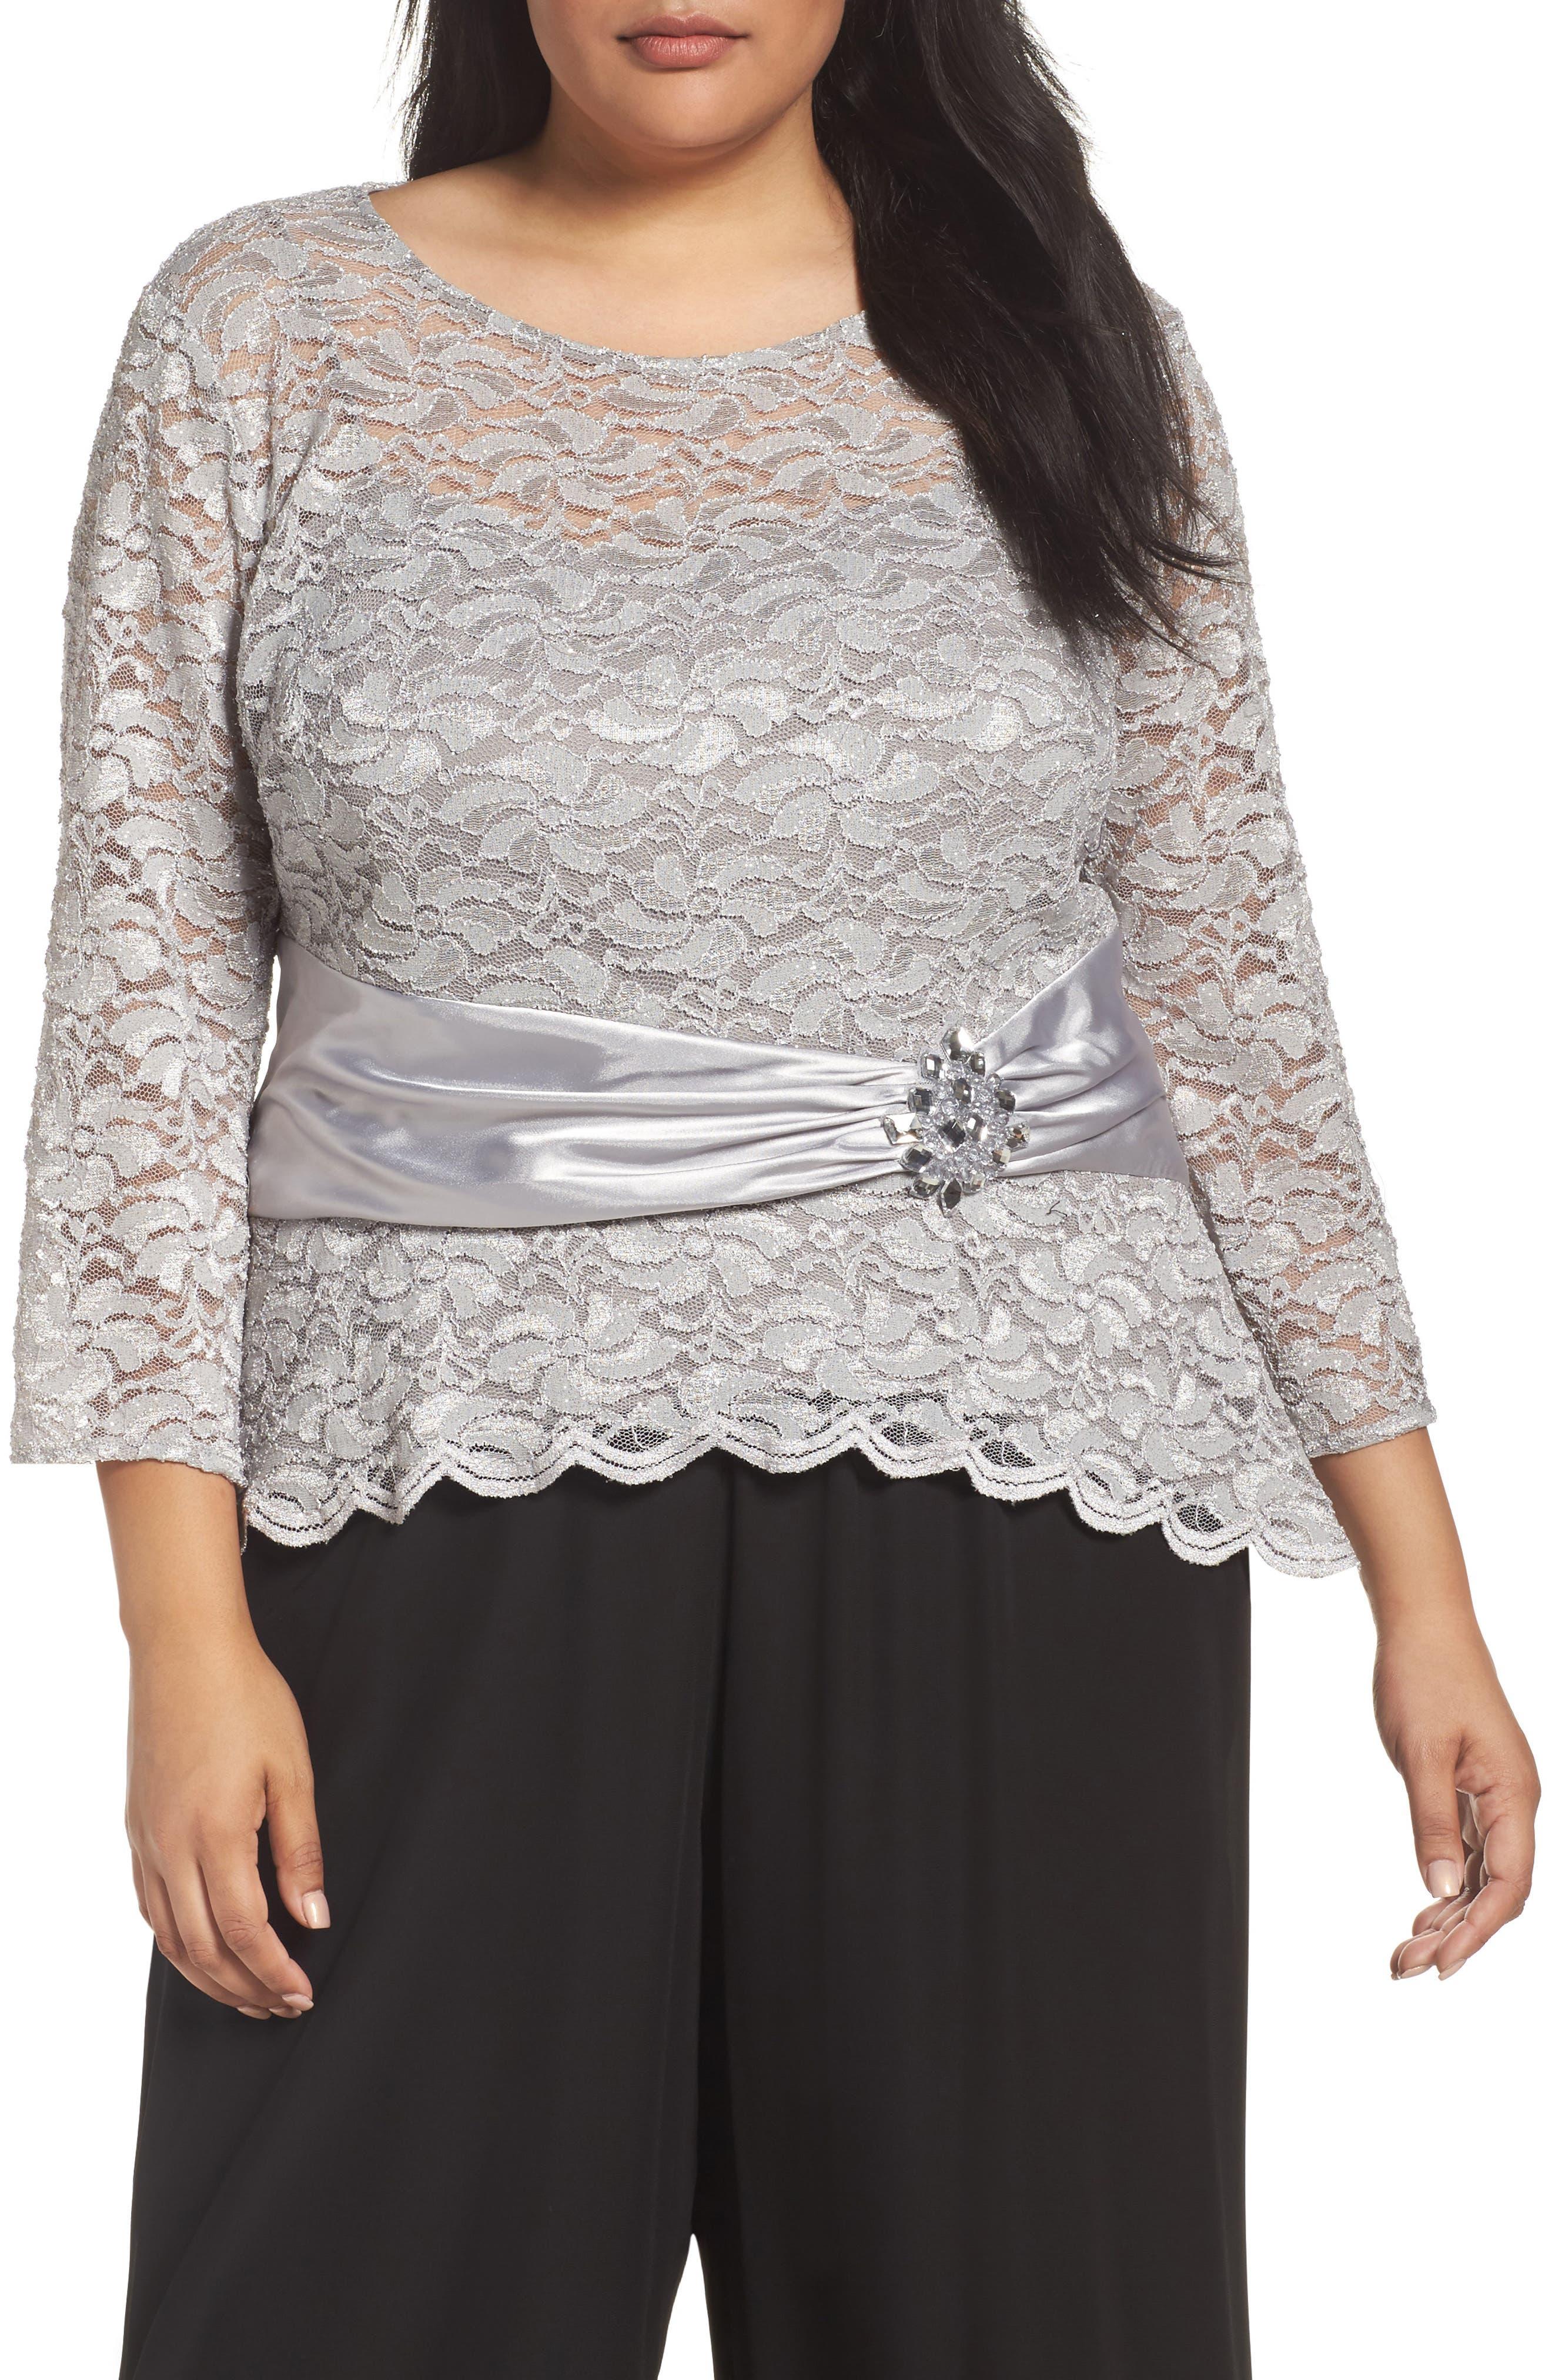 Alternate Image 1 Selected - Alex Evenings Ruched Waist Lace Blouse (Plus Size)